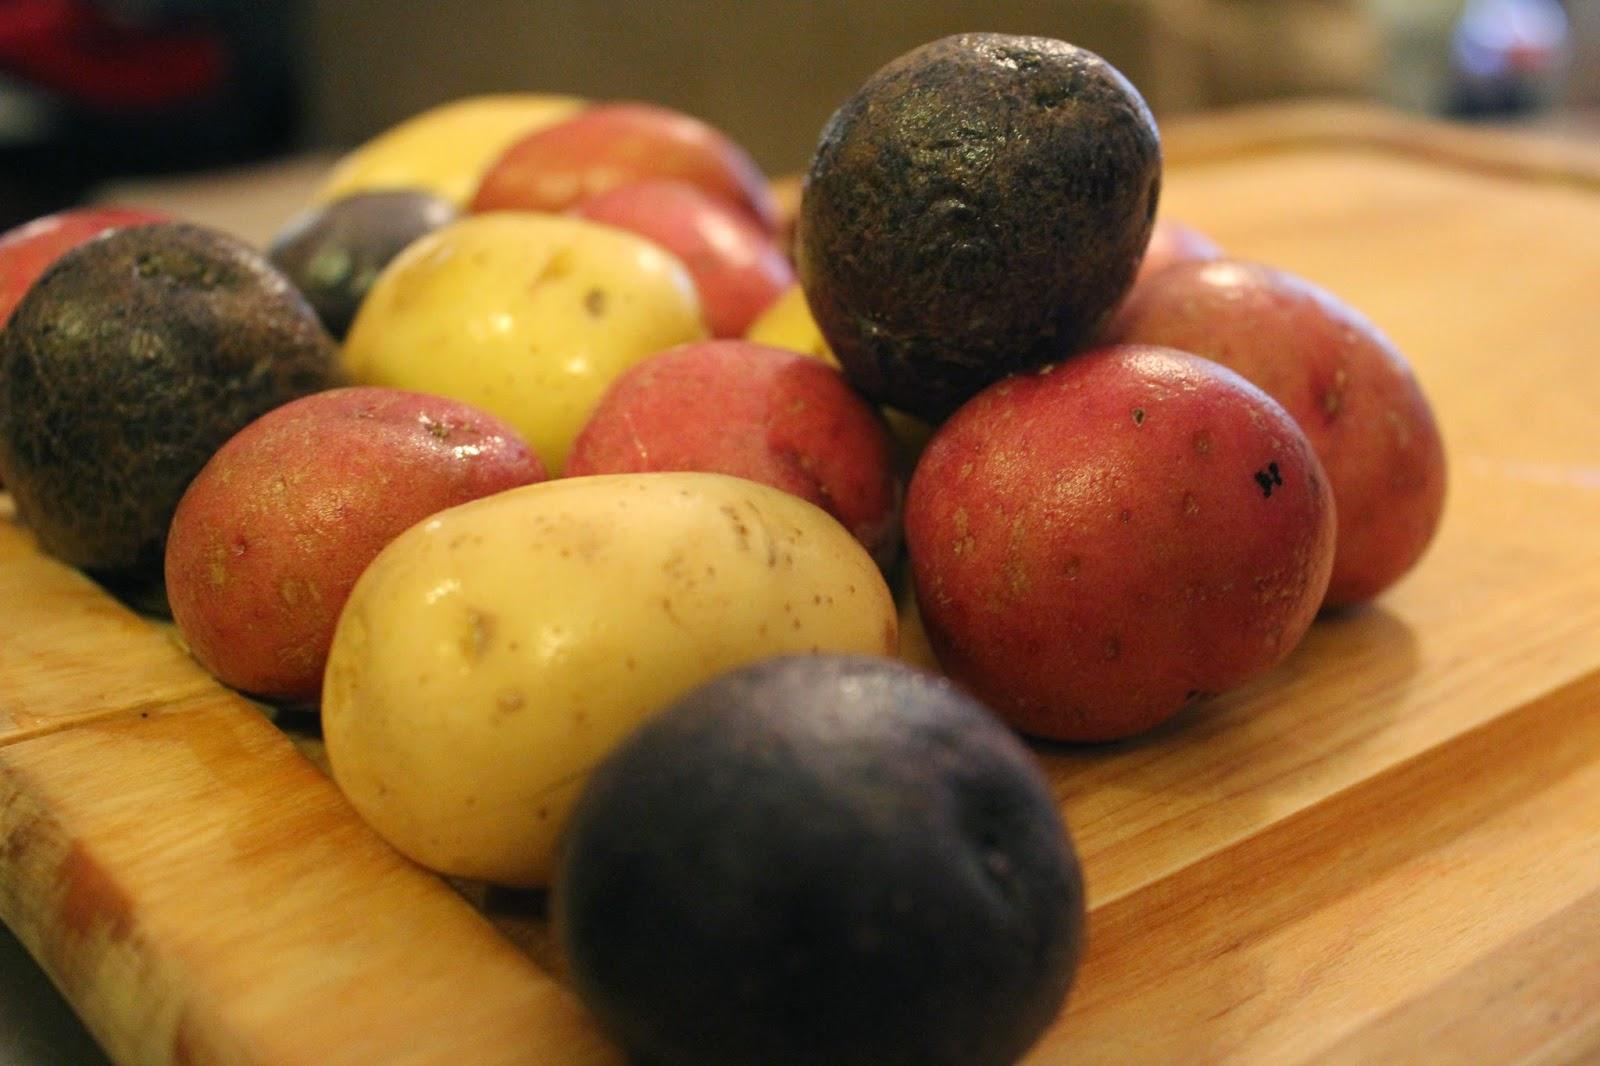 Treasuring Simplicity: Roasted Multi-Colored Potatoes